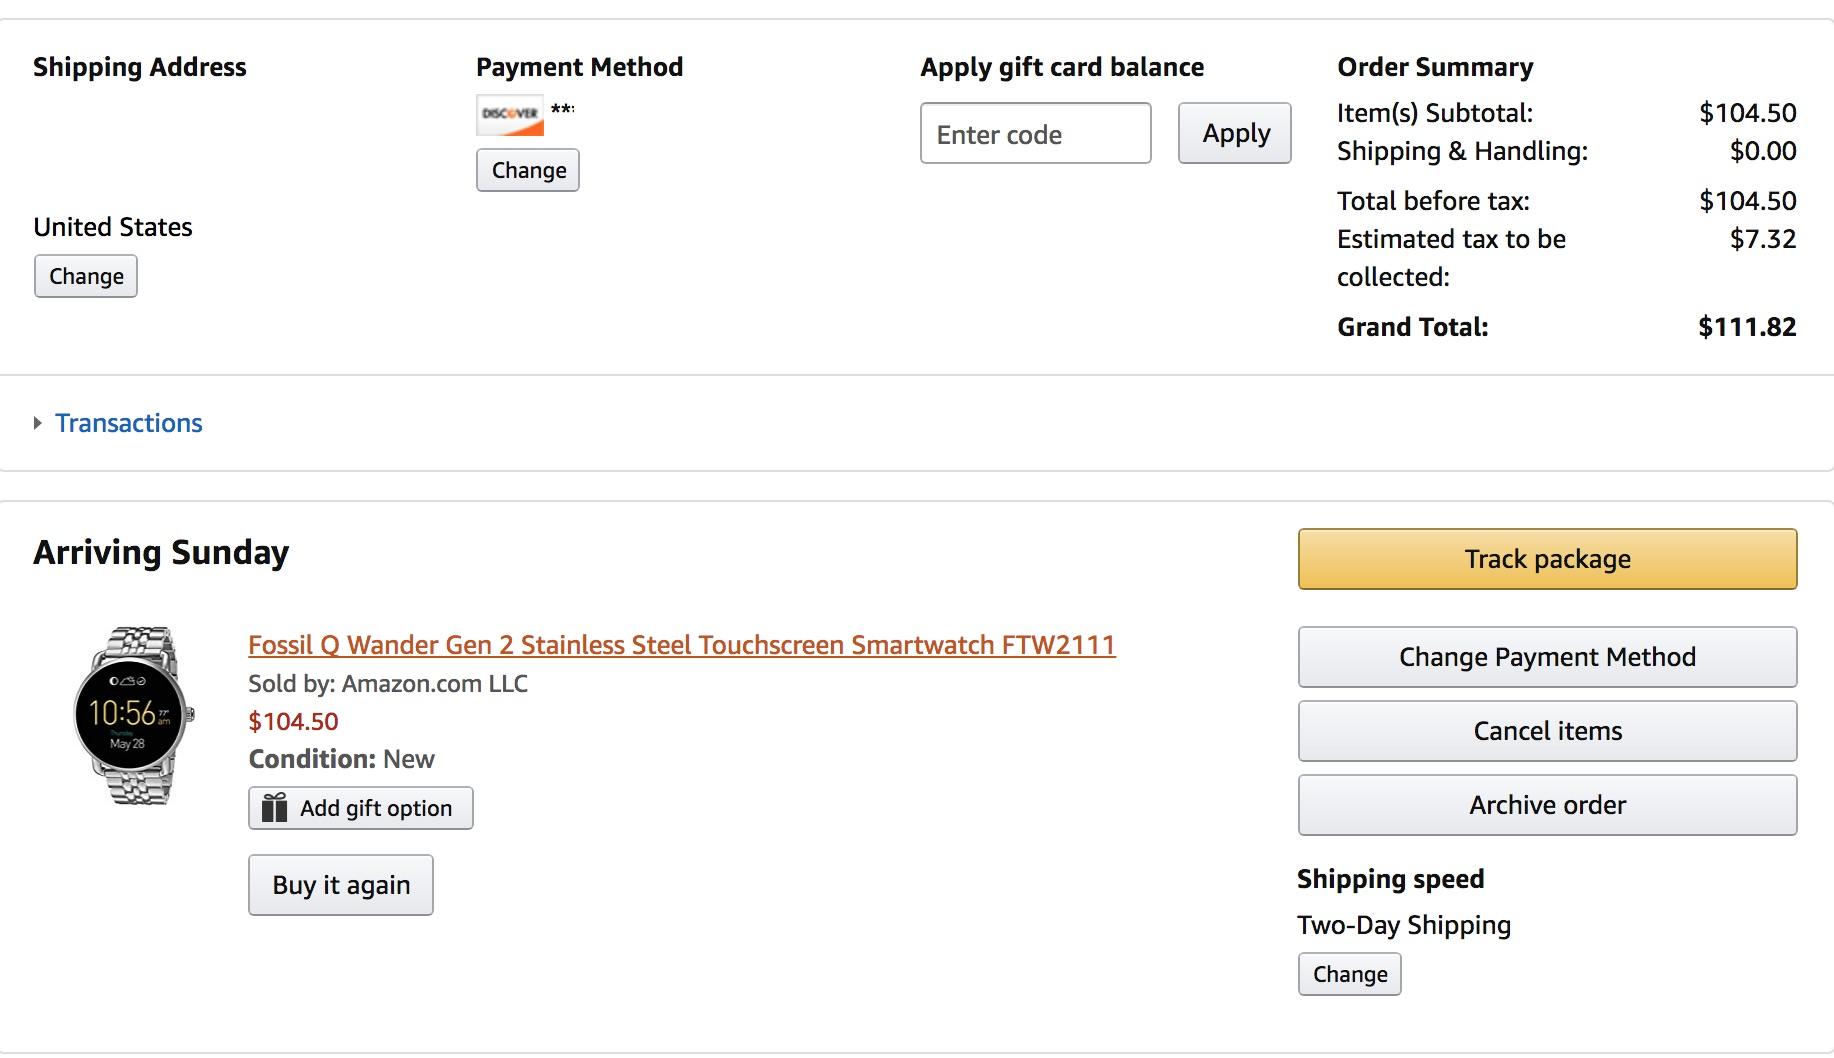 Fossil Q Wander Gen 2 Stainless Steel Touchscreen Smartwatch FTW2111 $104.50 at Amazon